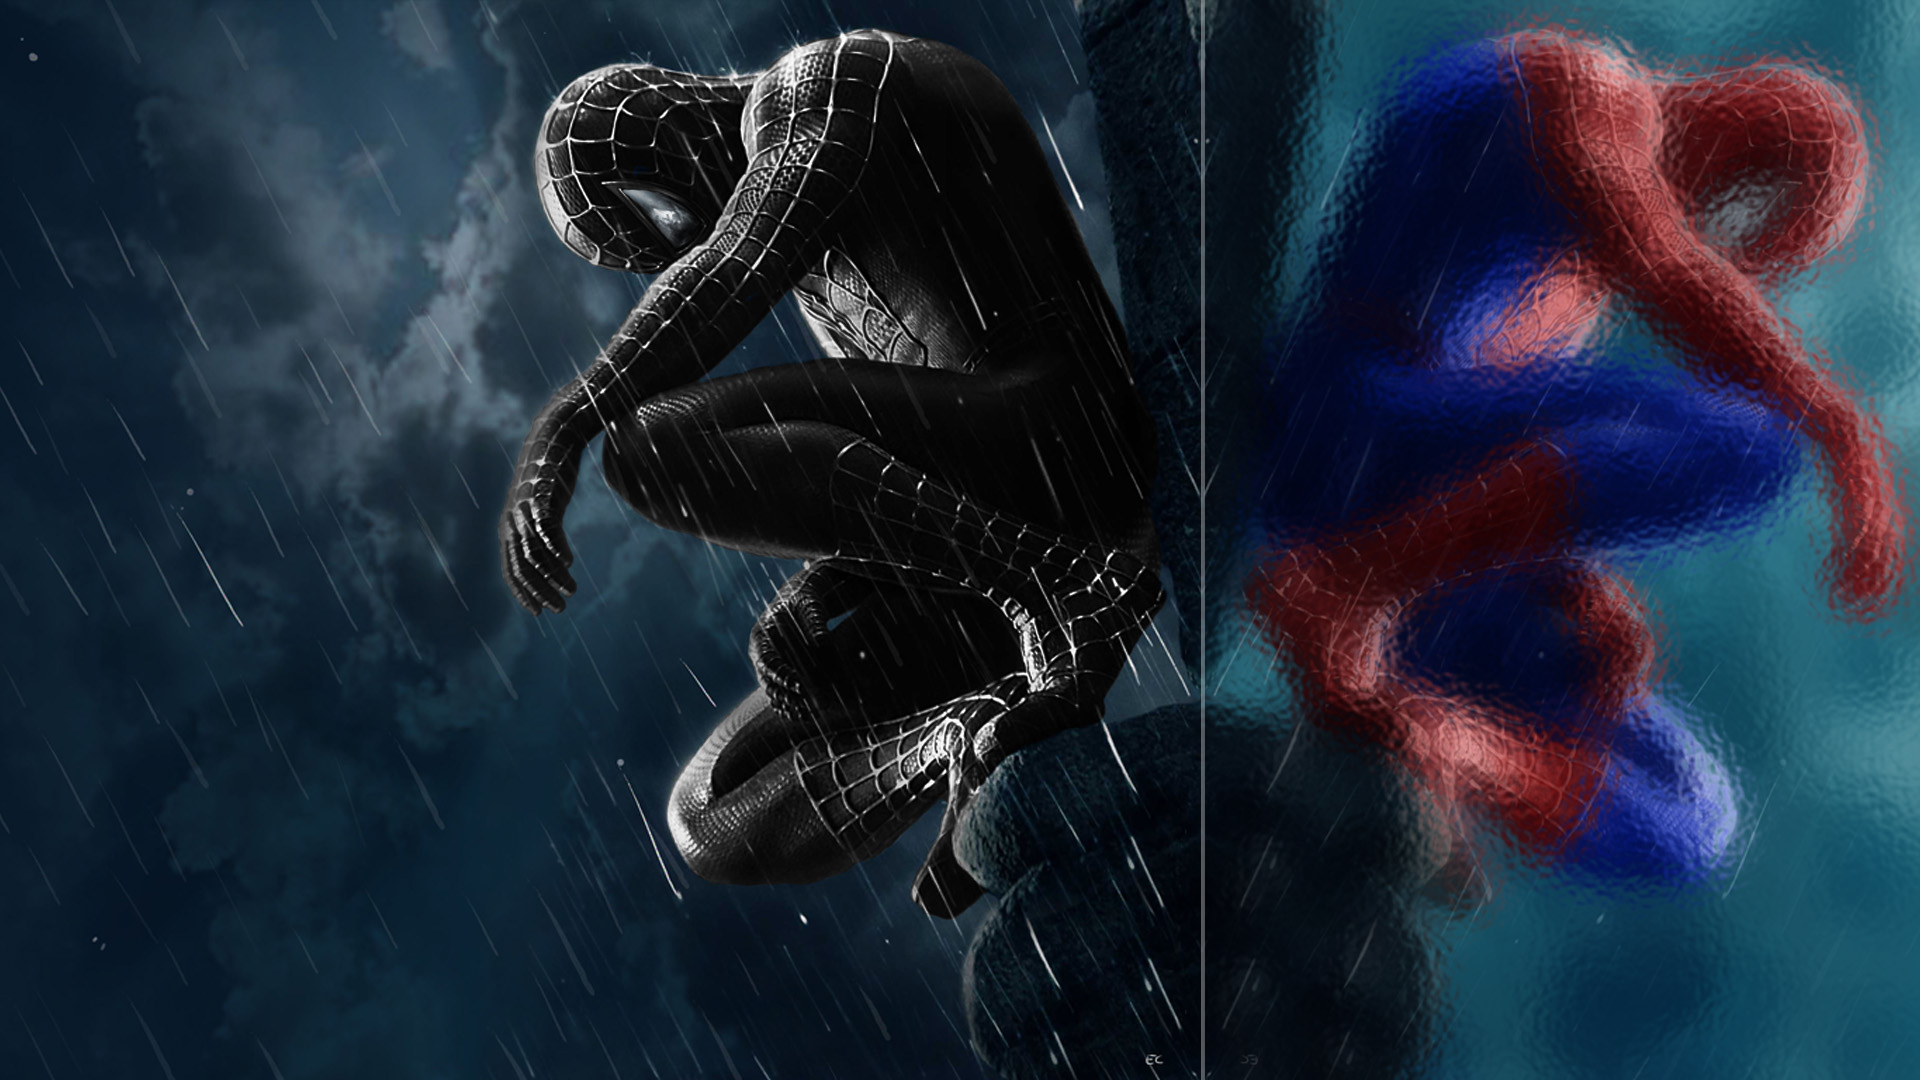 48 Spiderman 3 Wallpaper On Wallpapersafari